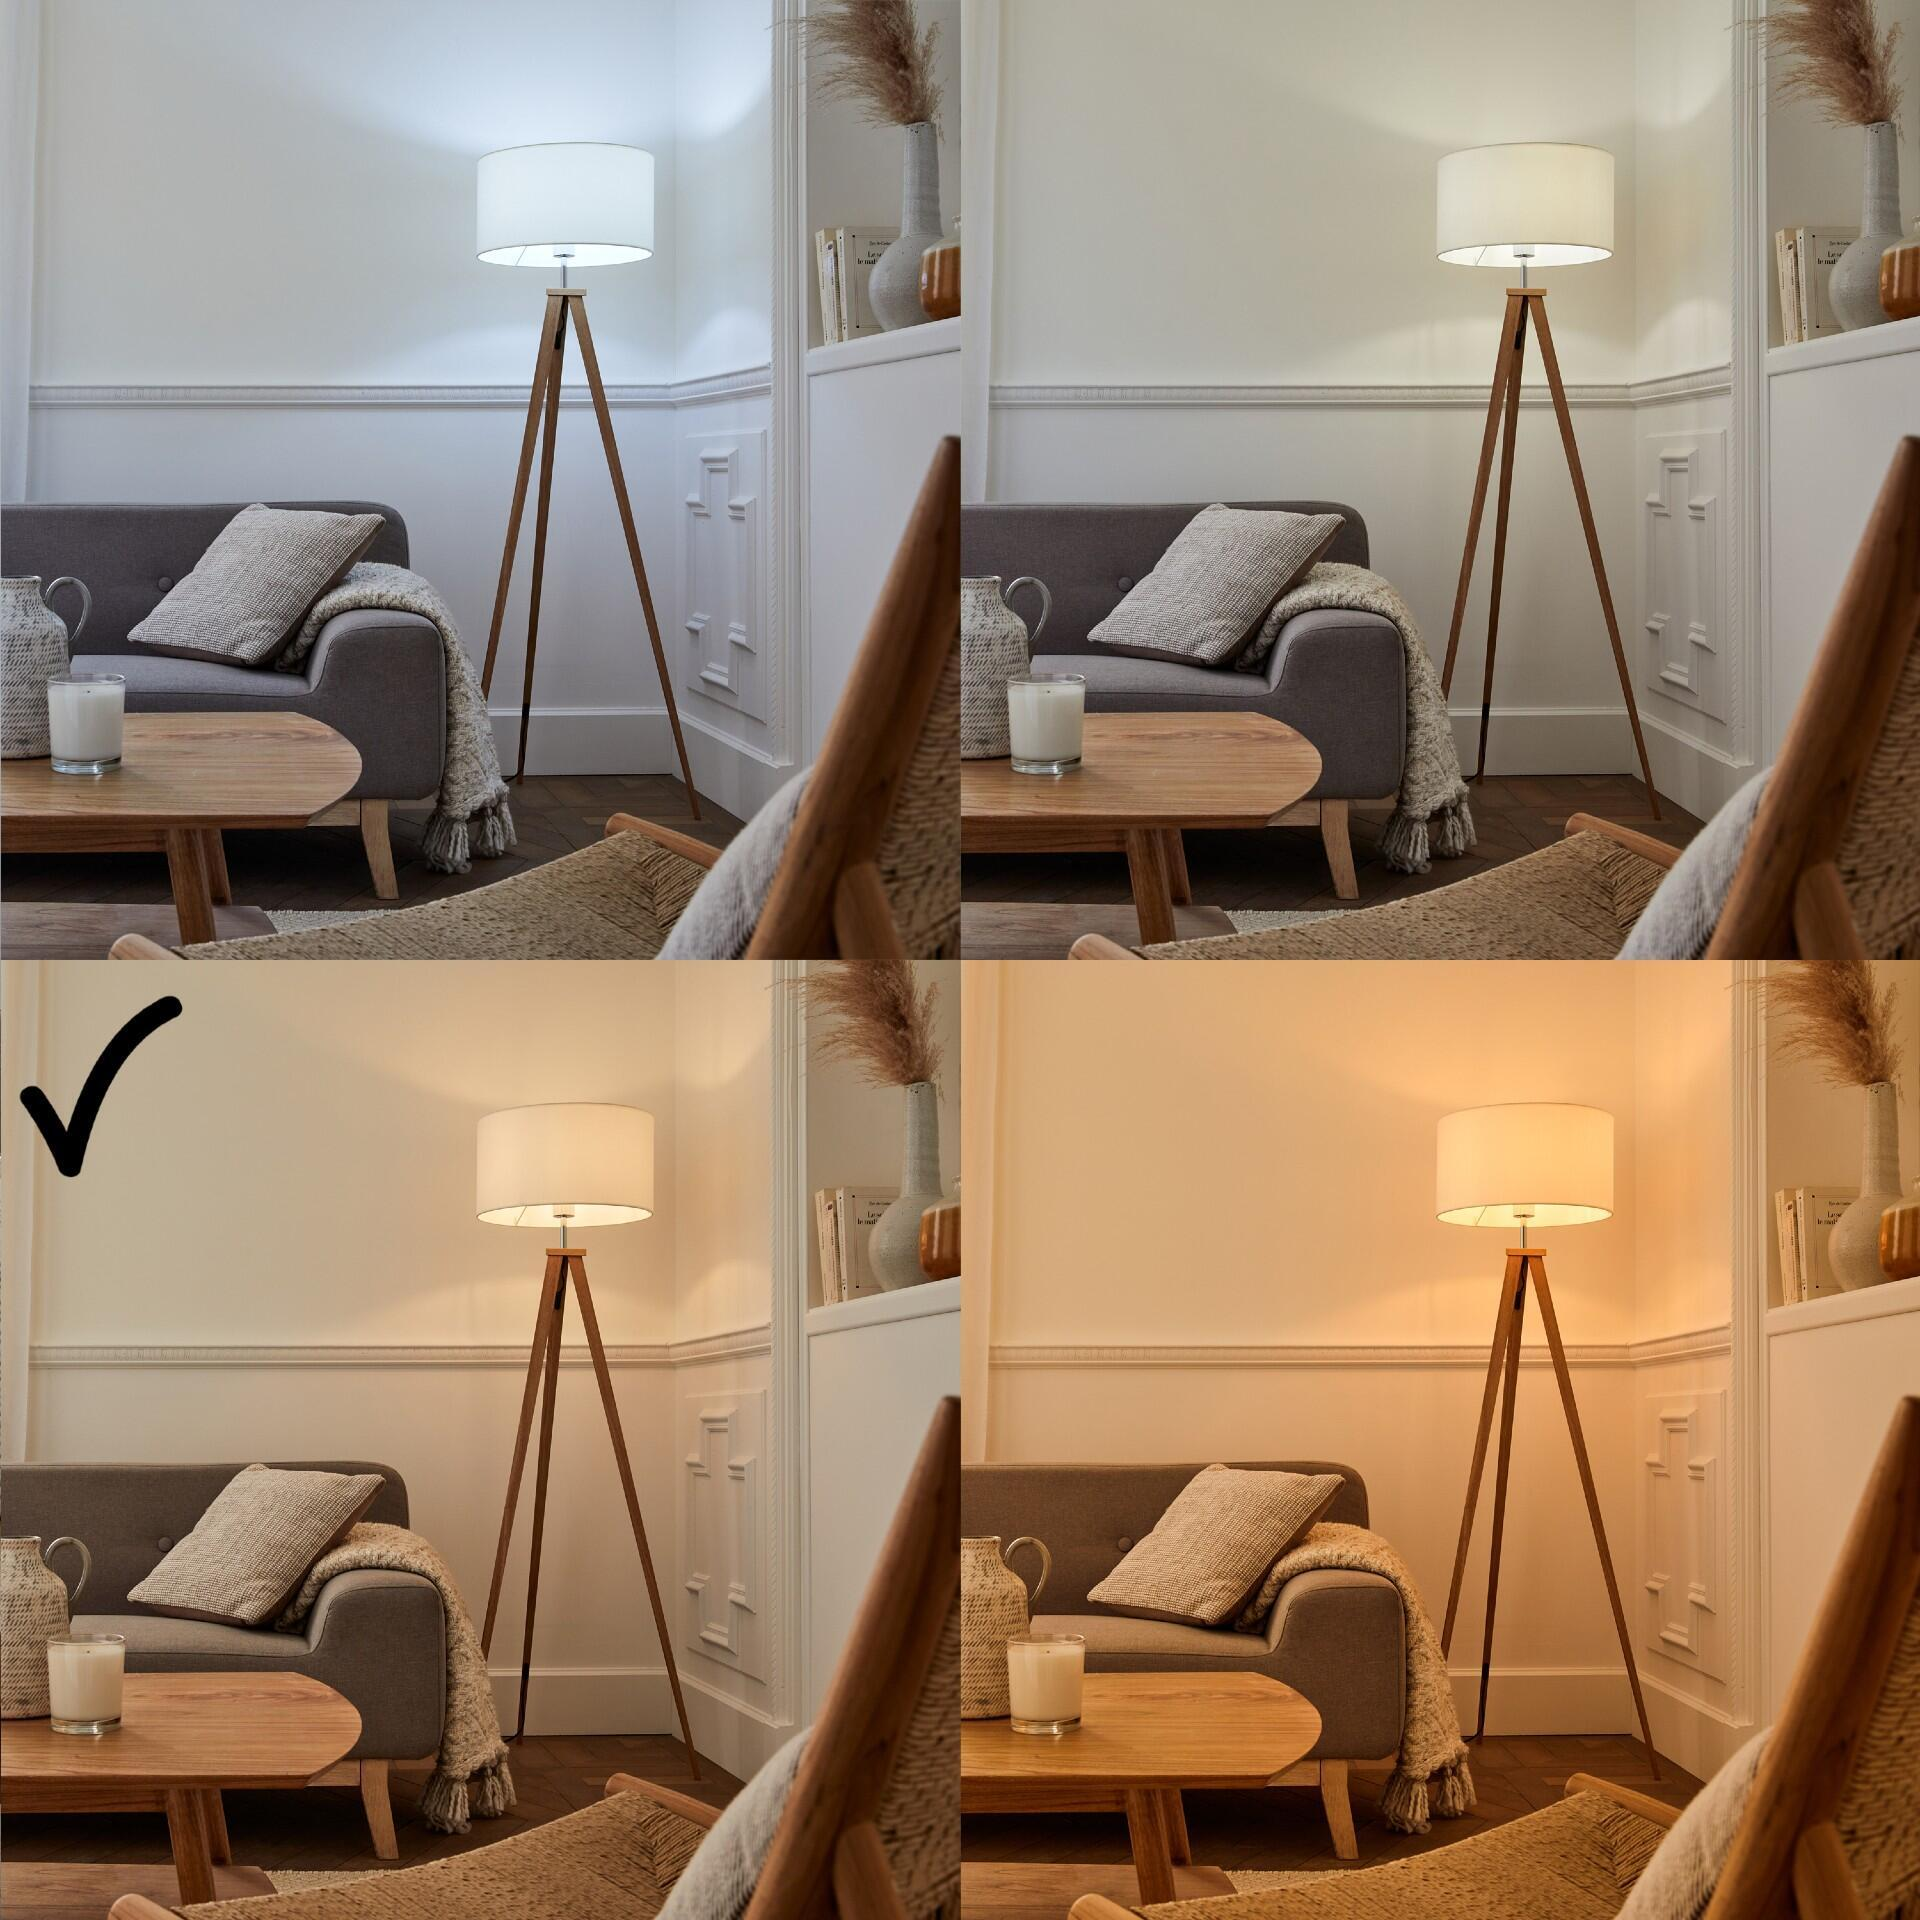 Set di 3 lampadine LED, HUE WHITE BLUETOOTH + BRIDGE + DIMMER, E27, Goccia, Opaco, Luce calda, 9W=806LM (equiv 60 W), 150° , PHILIPS HUE - 4